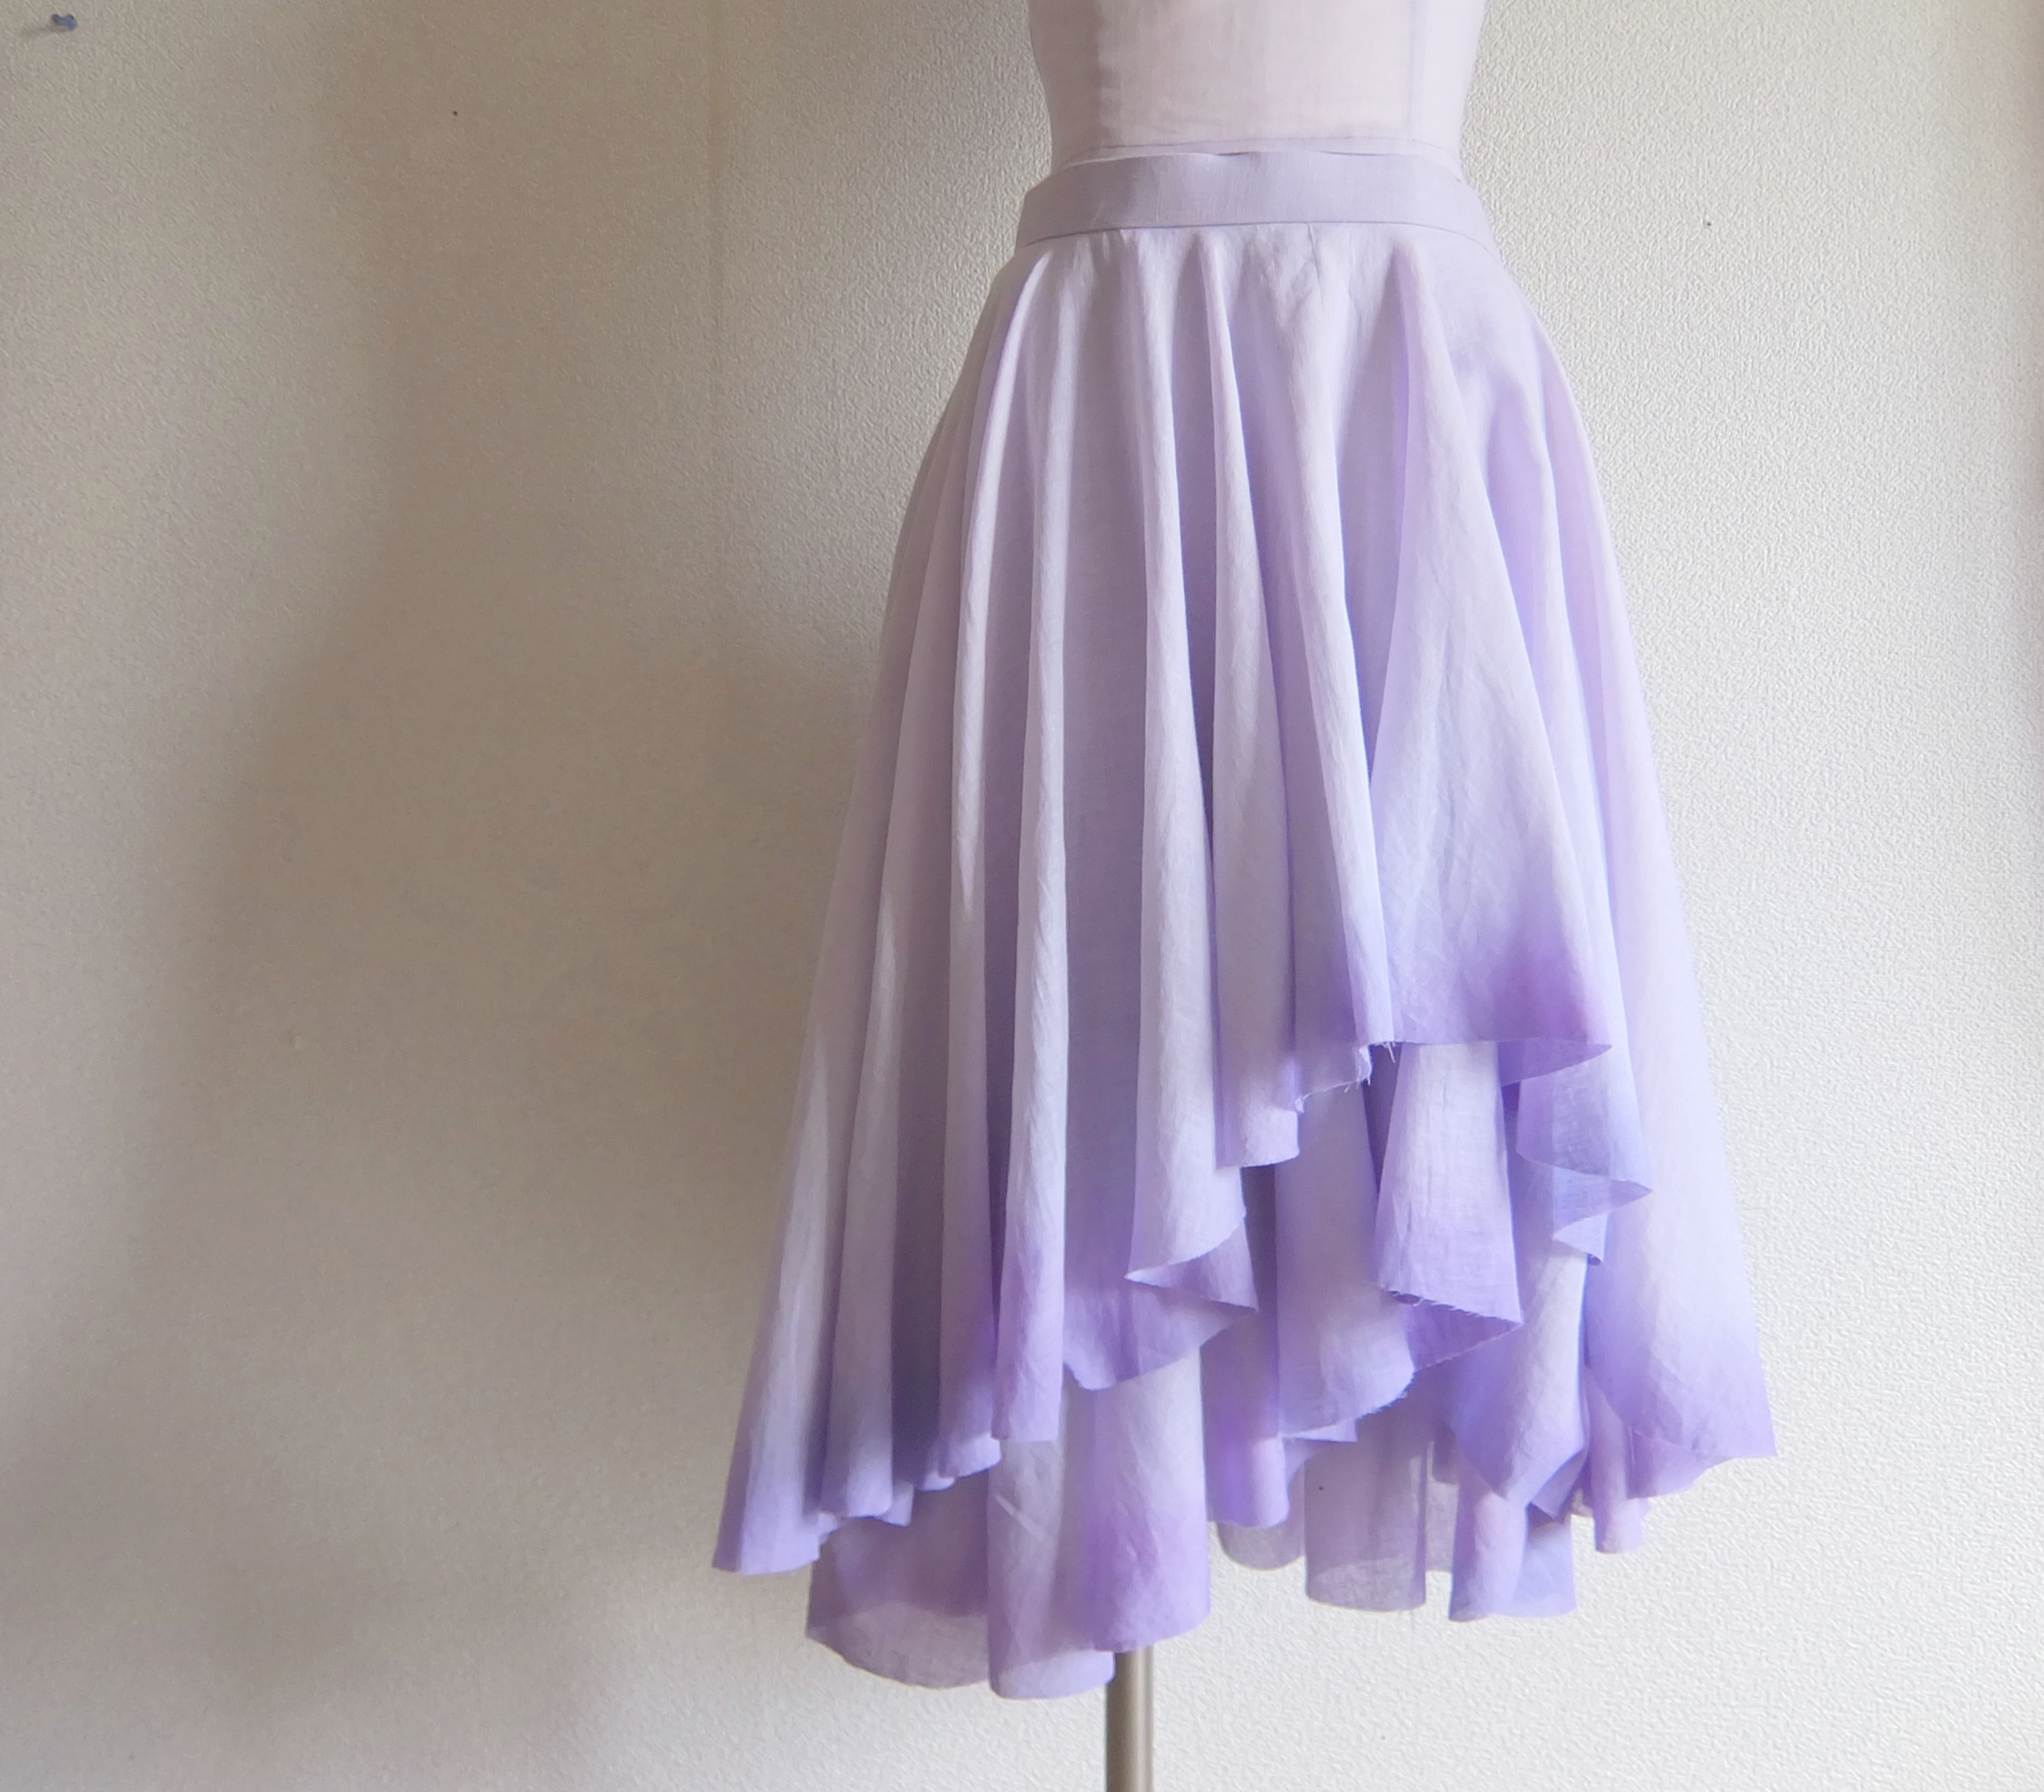 hydrangea skirt